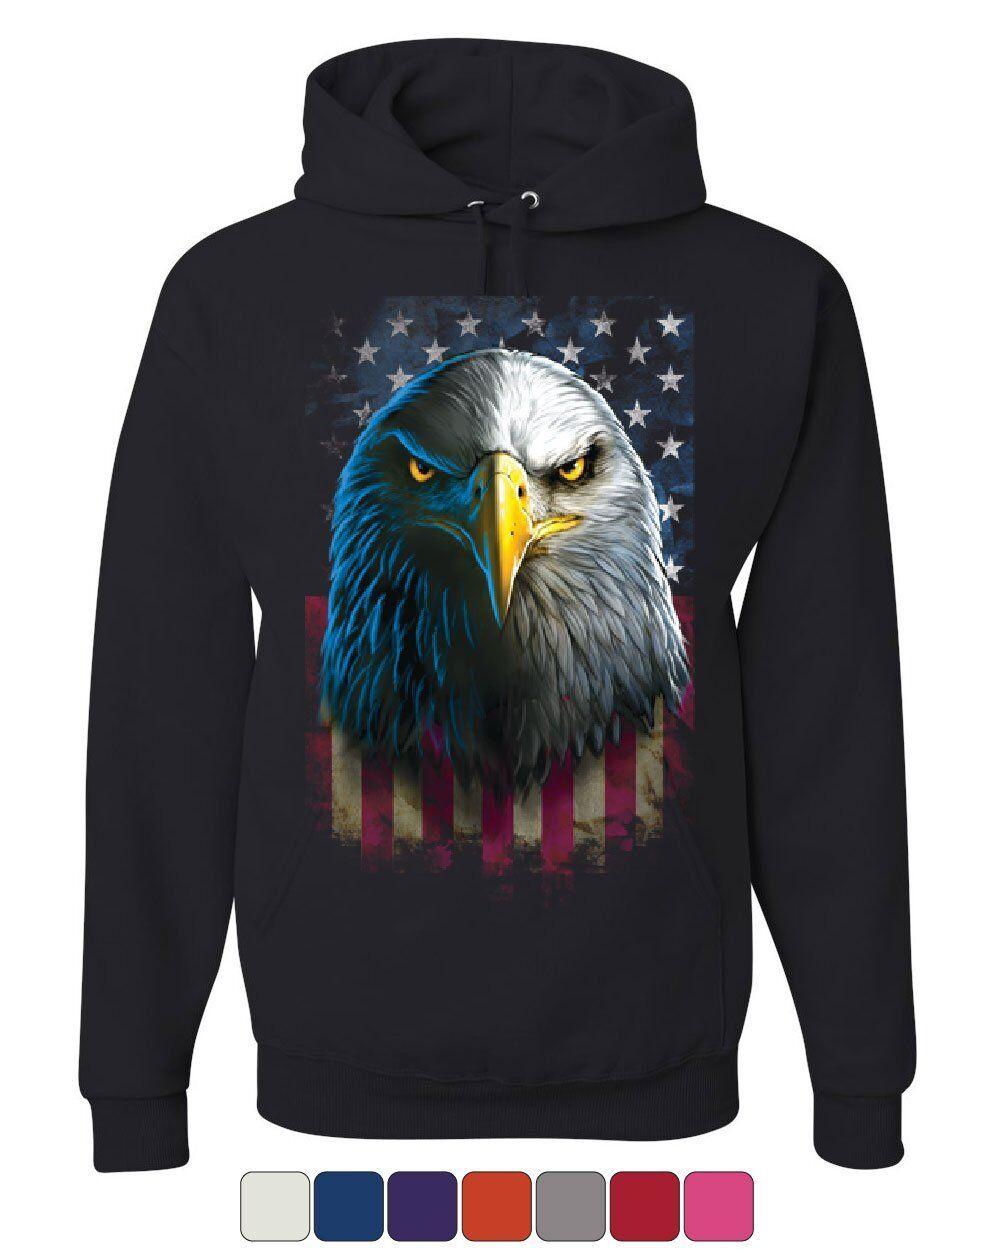 Bald Eagle Stare Hoodie 4th of July USA Stars and Stripes Flag Sweatshirt